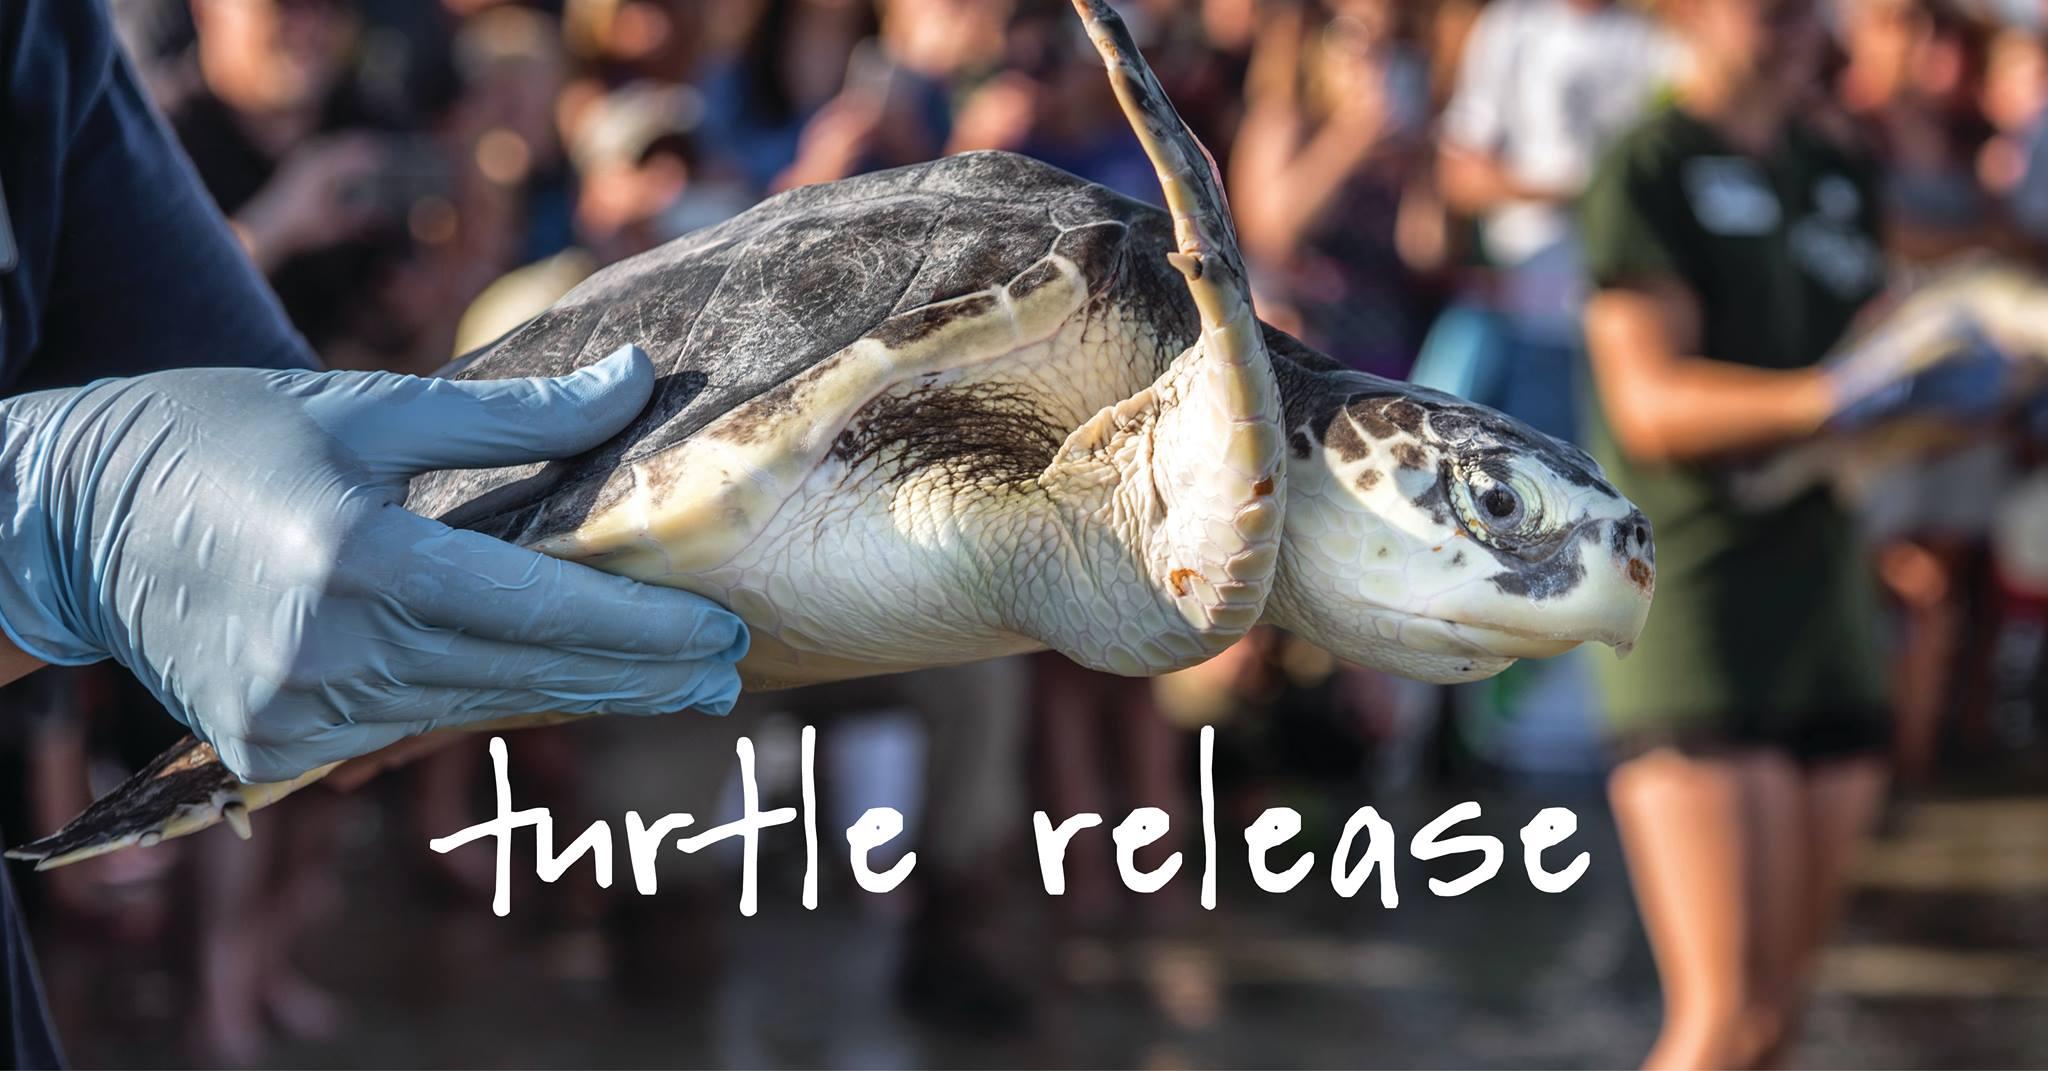 Sea Turtle Release Jekyll Island Savannah daytrips